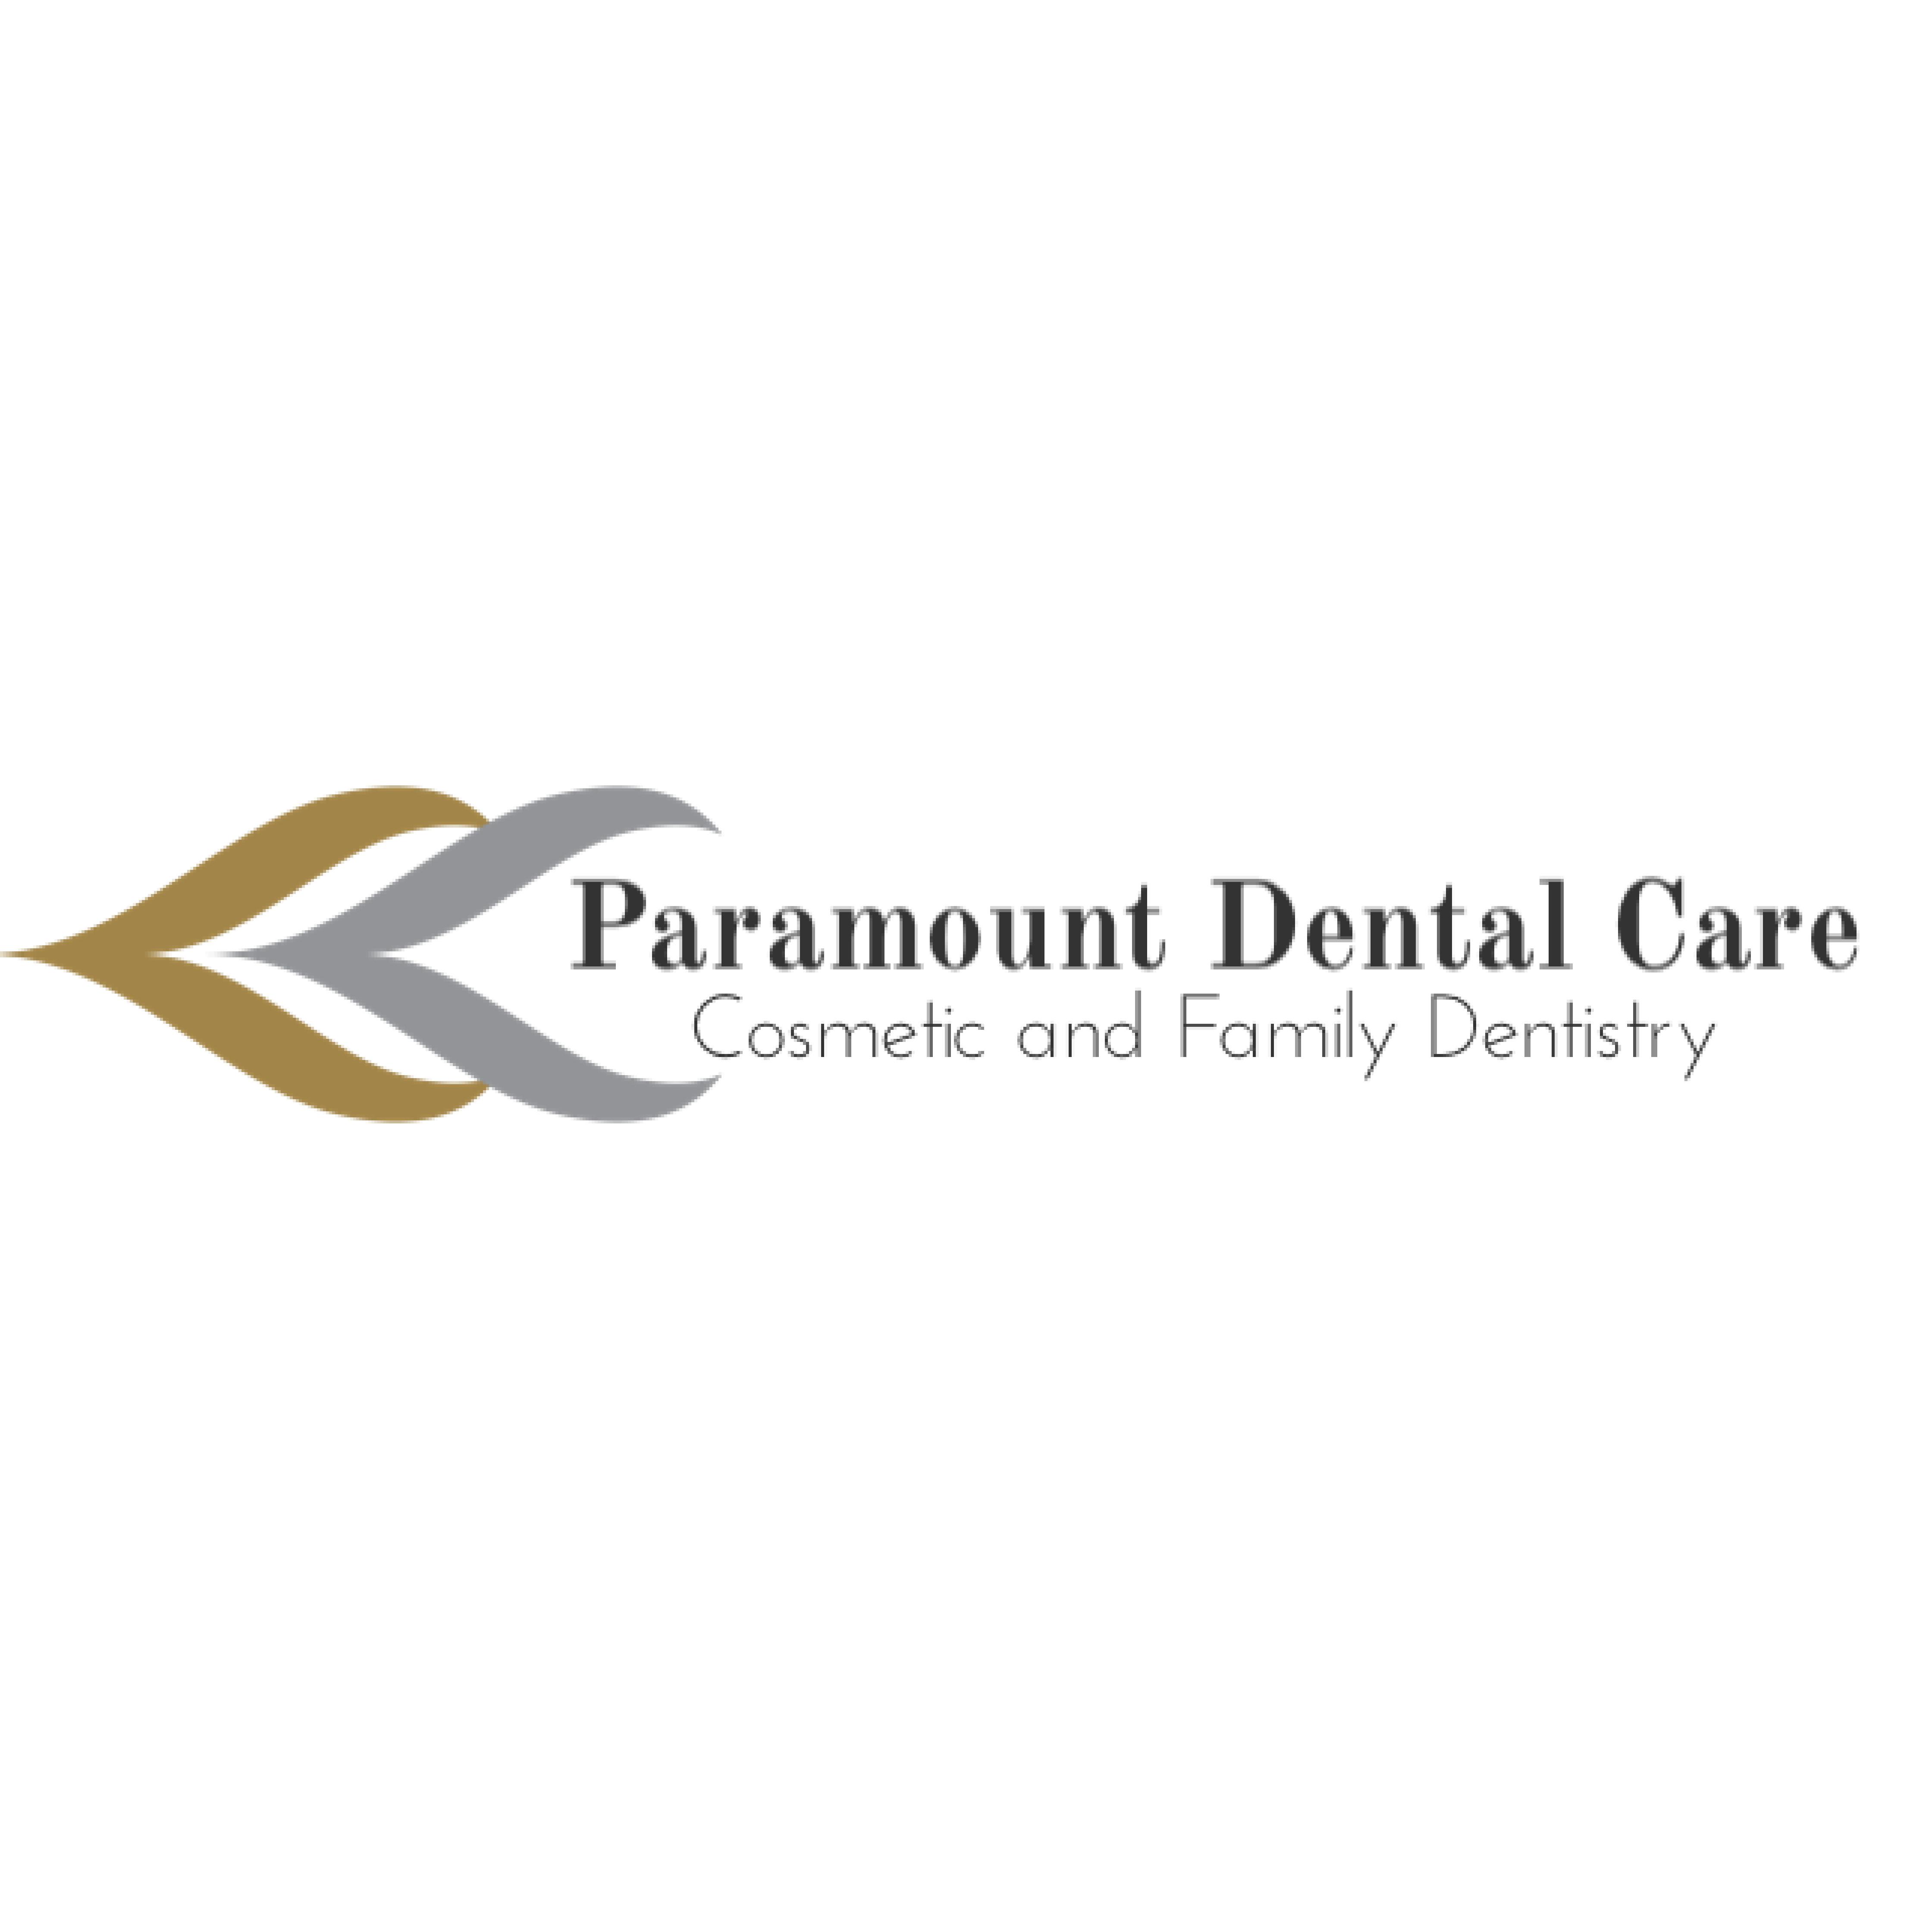 Paramount Dental Care